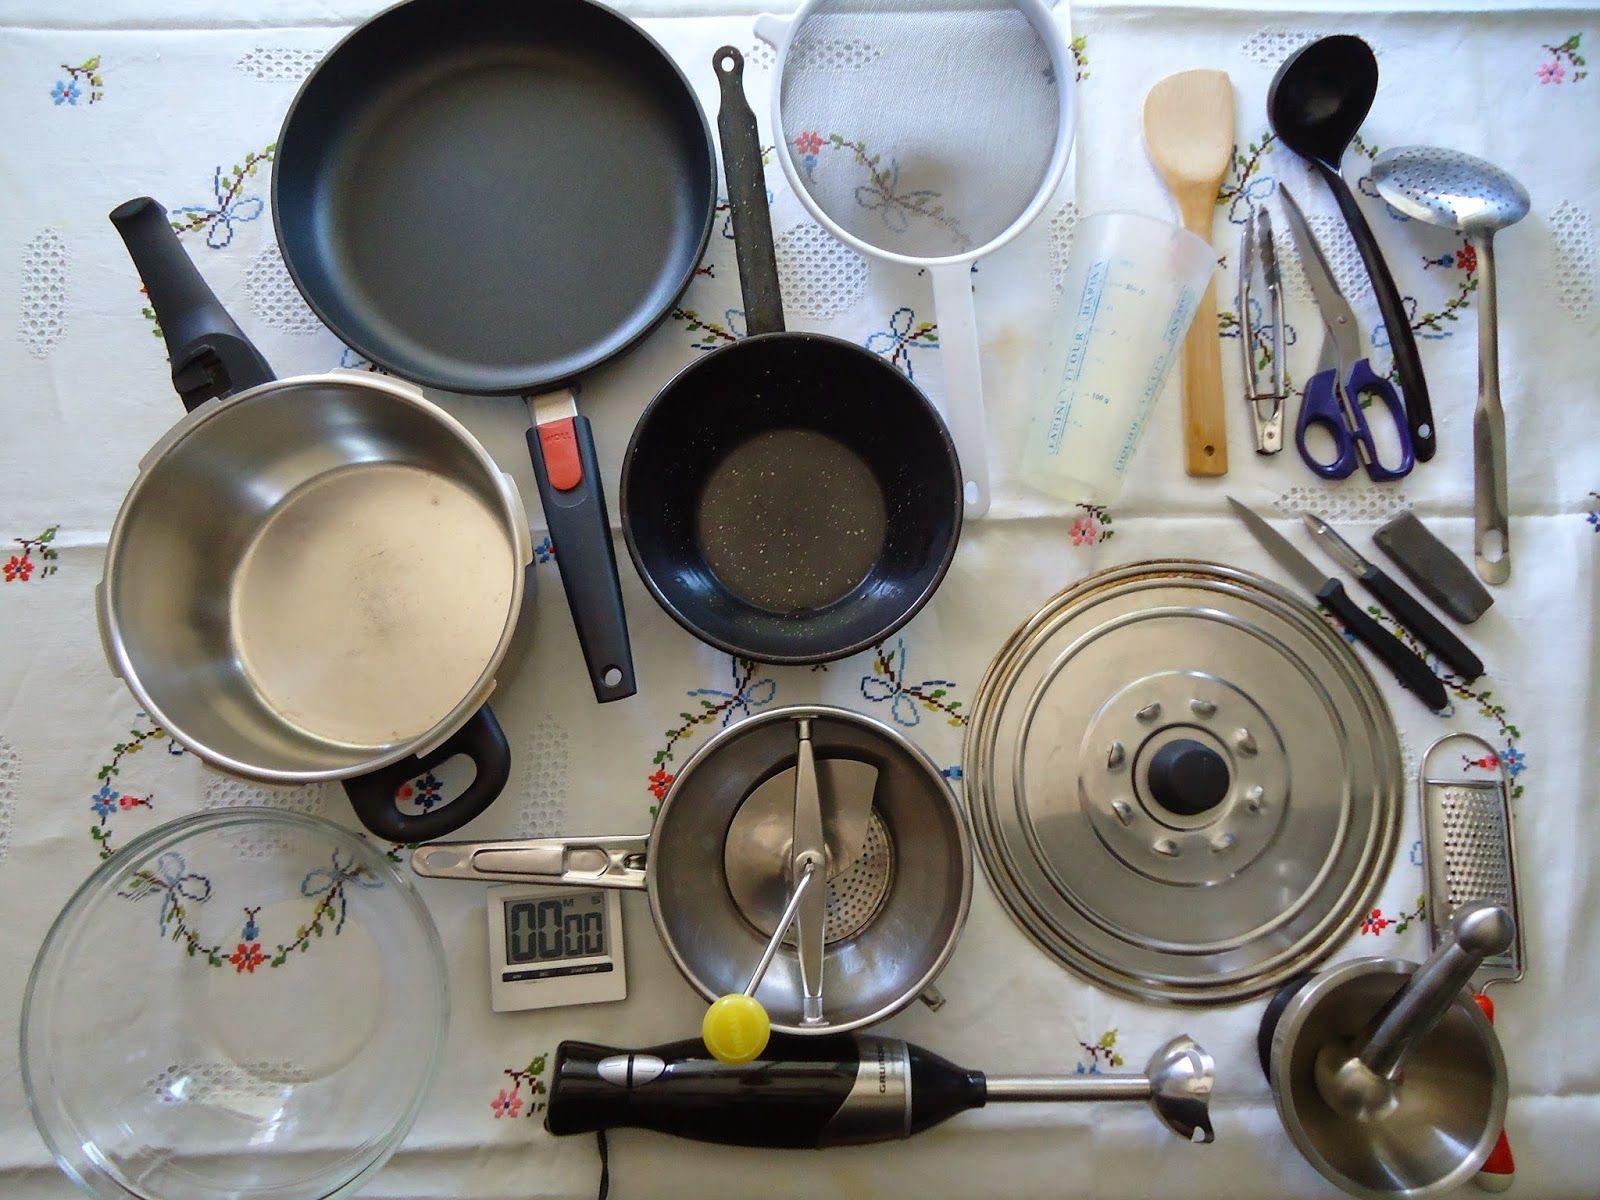 utensilios de cocina …   Recetas de cocina   Pinterest   Utensilios ...